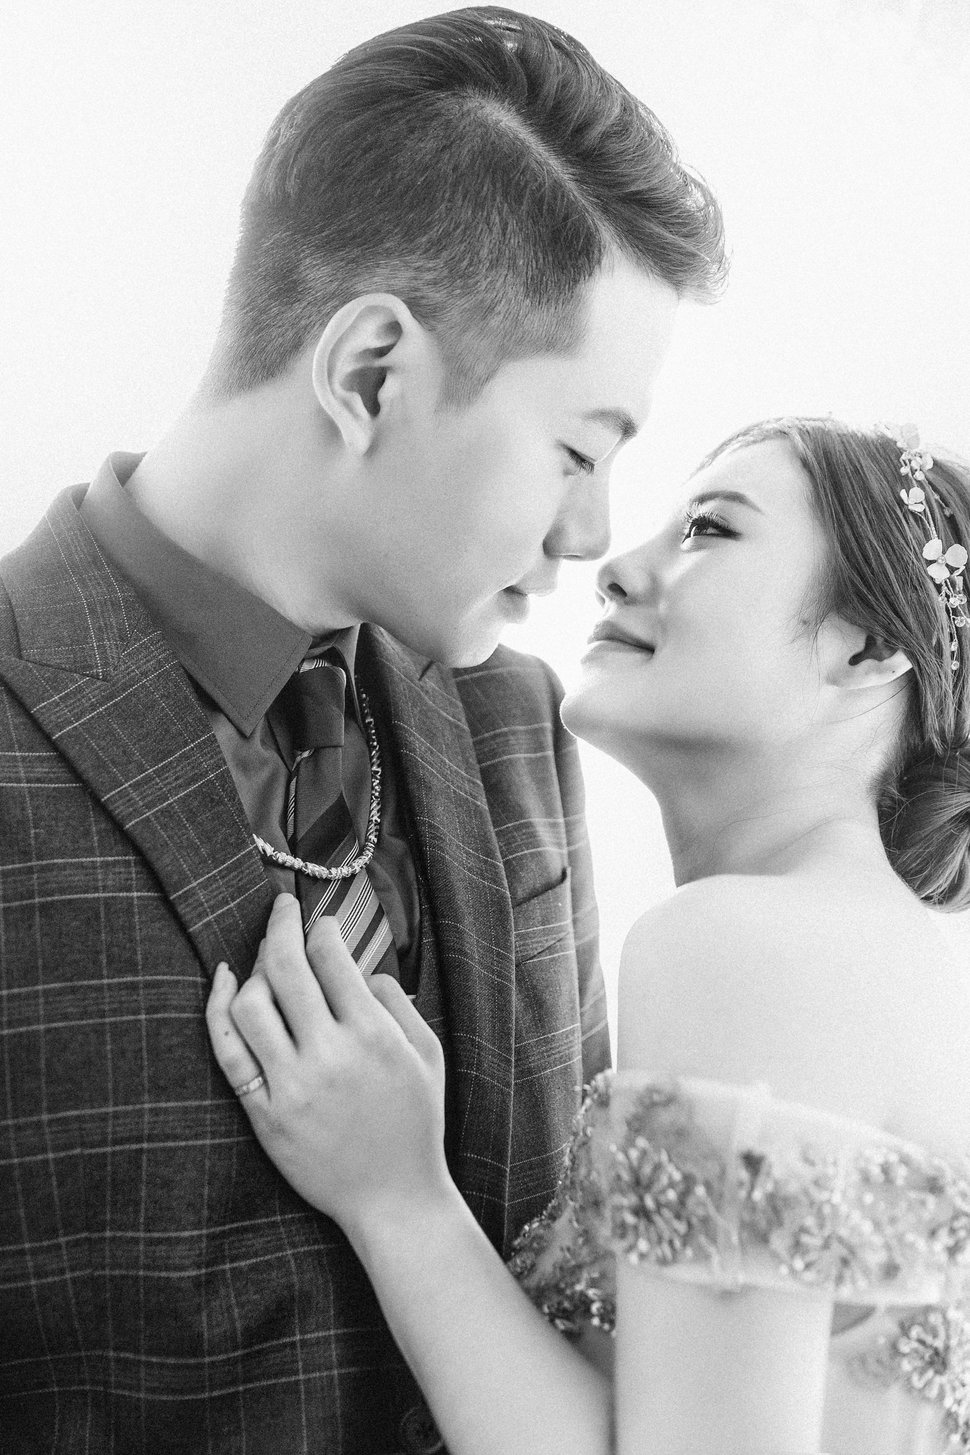 20190914-20190914-QUAN4514-編輯-編輯-2 - QUAN  婚禮紀錄 / 影像工作室《結婚吧》